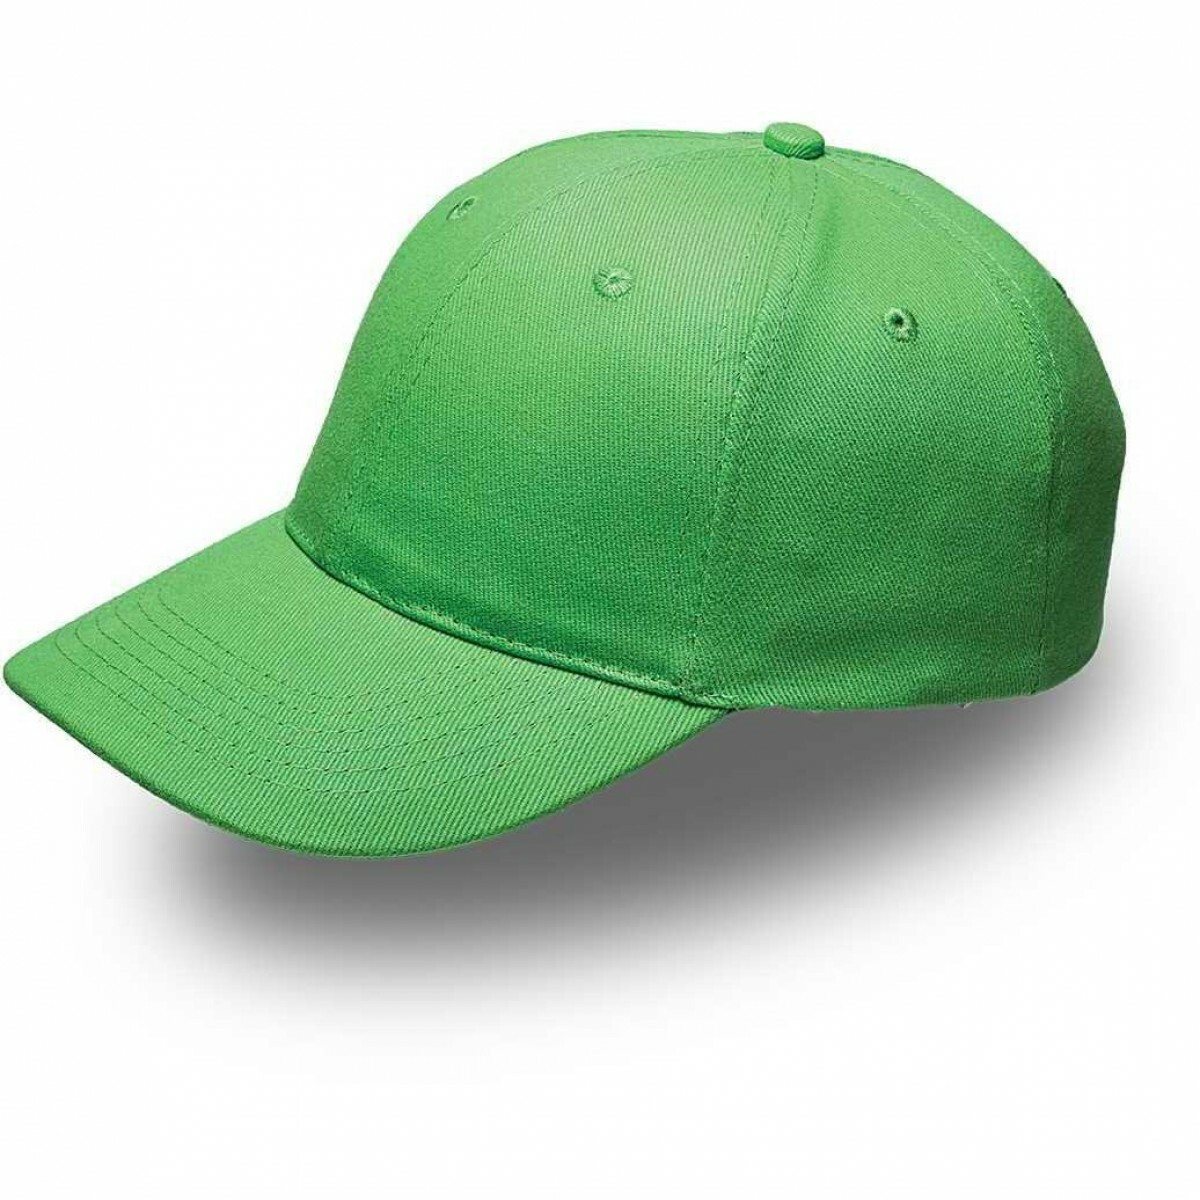 Promotional Headwear Pretoria I 6 Panel Brushed Cotton Cap I Mr Cap 90c40f5a747